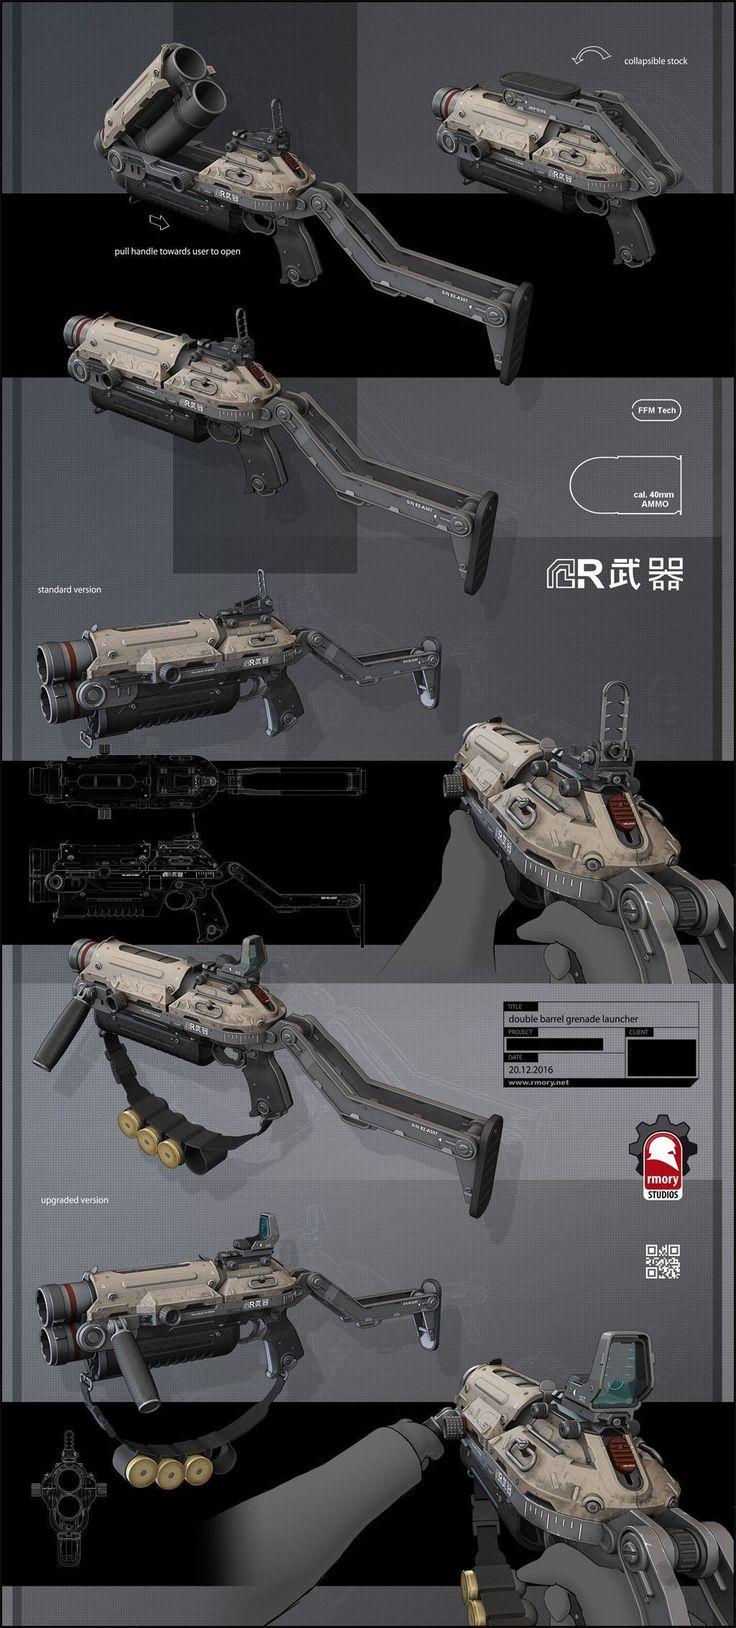 ArtStation - Double Barrel Grenade Launcher by rmory studios, Kris Thaler #DronesConcept #droneconcept